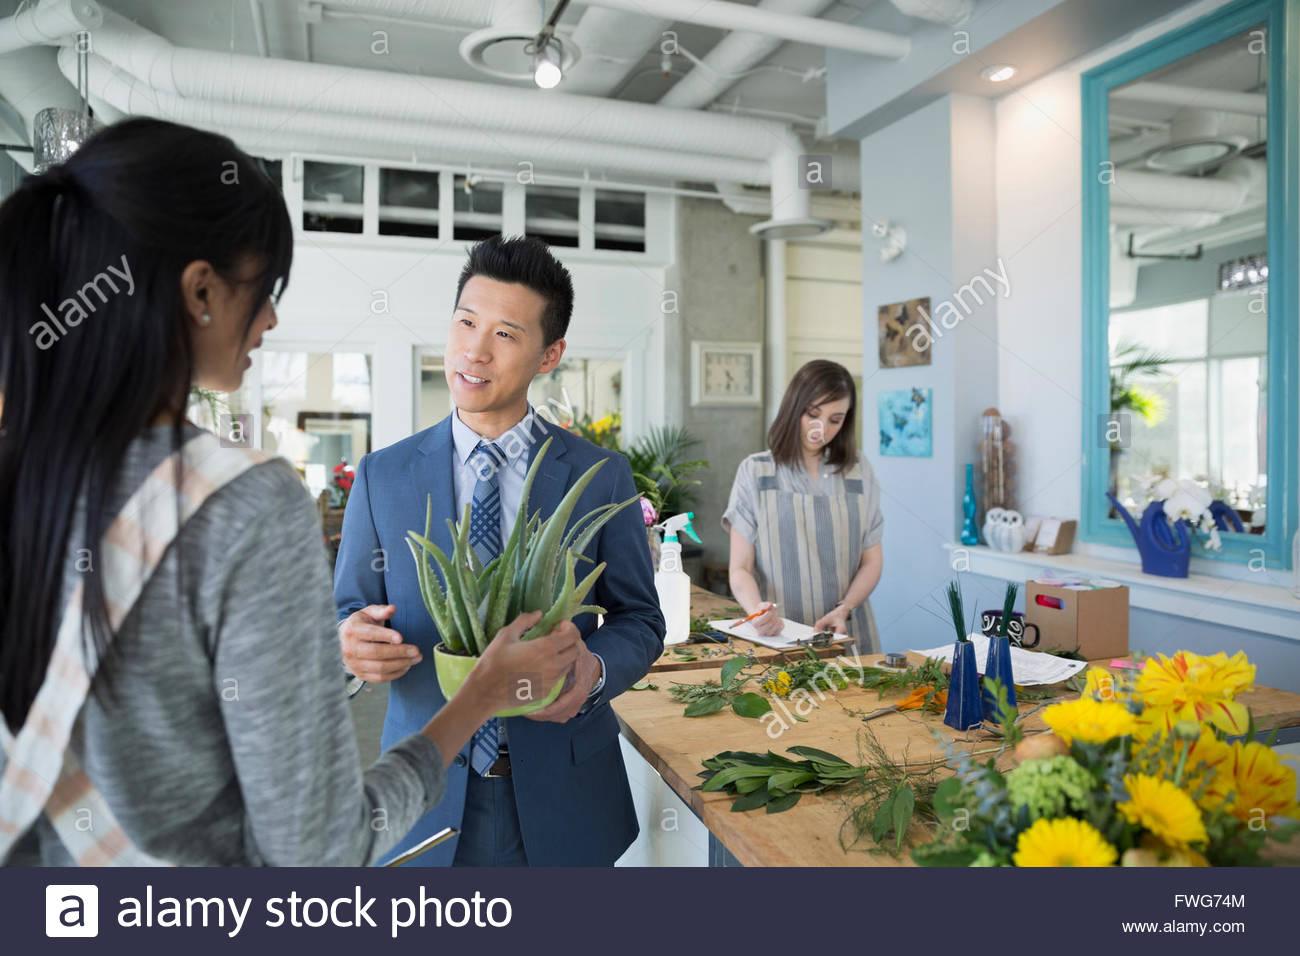 Florist helping customer in flower shop - Stock Image